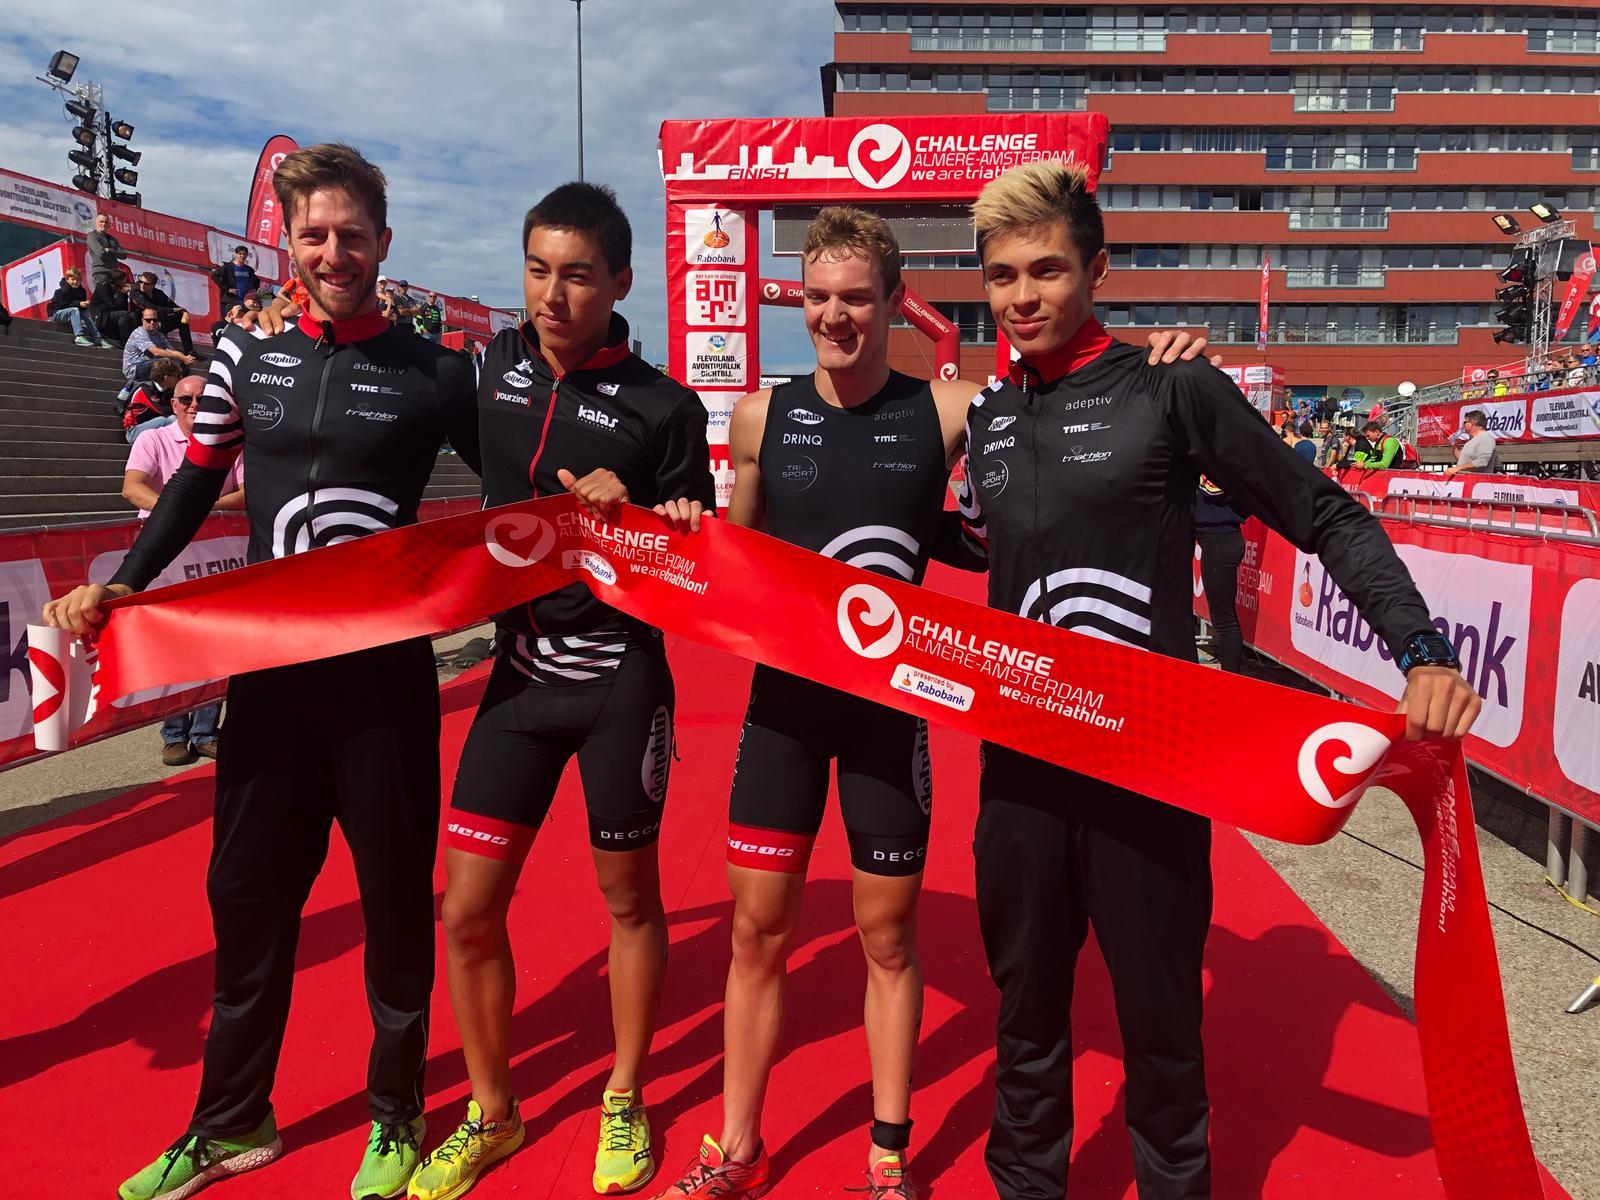 Tim Van Hemel, Finn Timmermans, Jonathan Wayaffe en Neal Van Vaerenbergh (foto: 3athlon.nl)